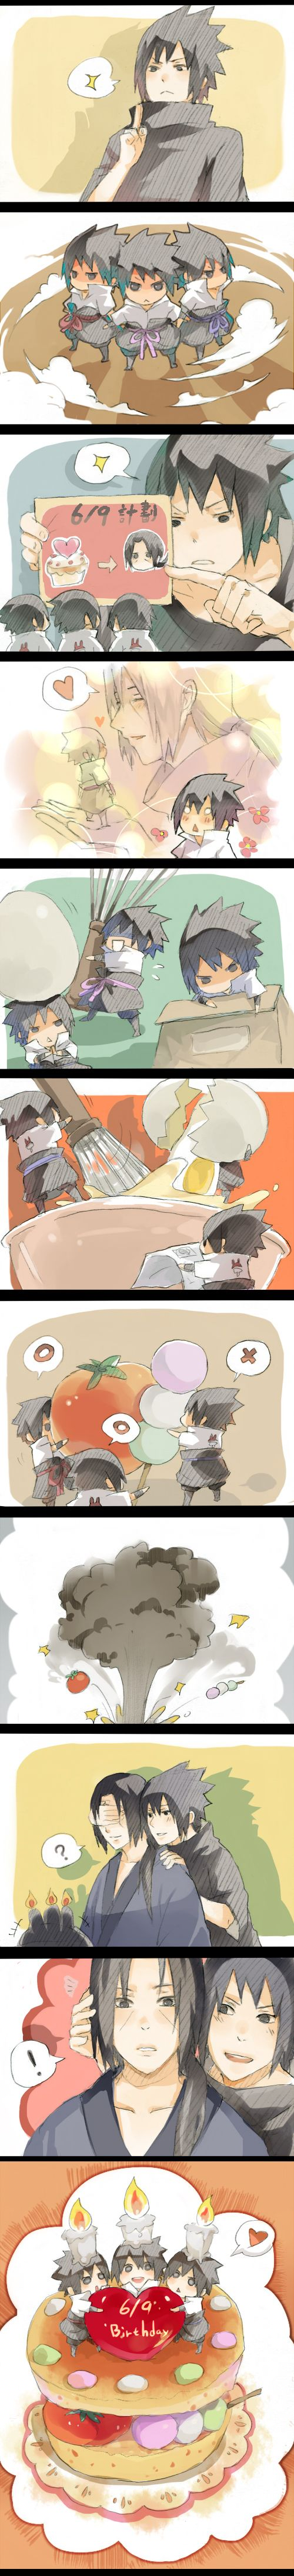 I want chibi Sasukes to make me stuff for my birthday in 2 days ;-;